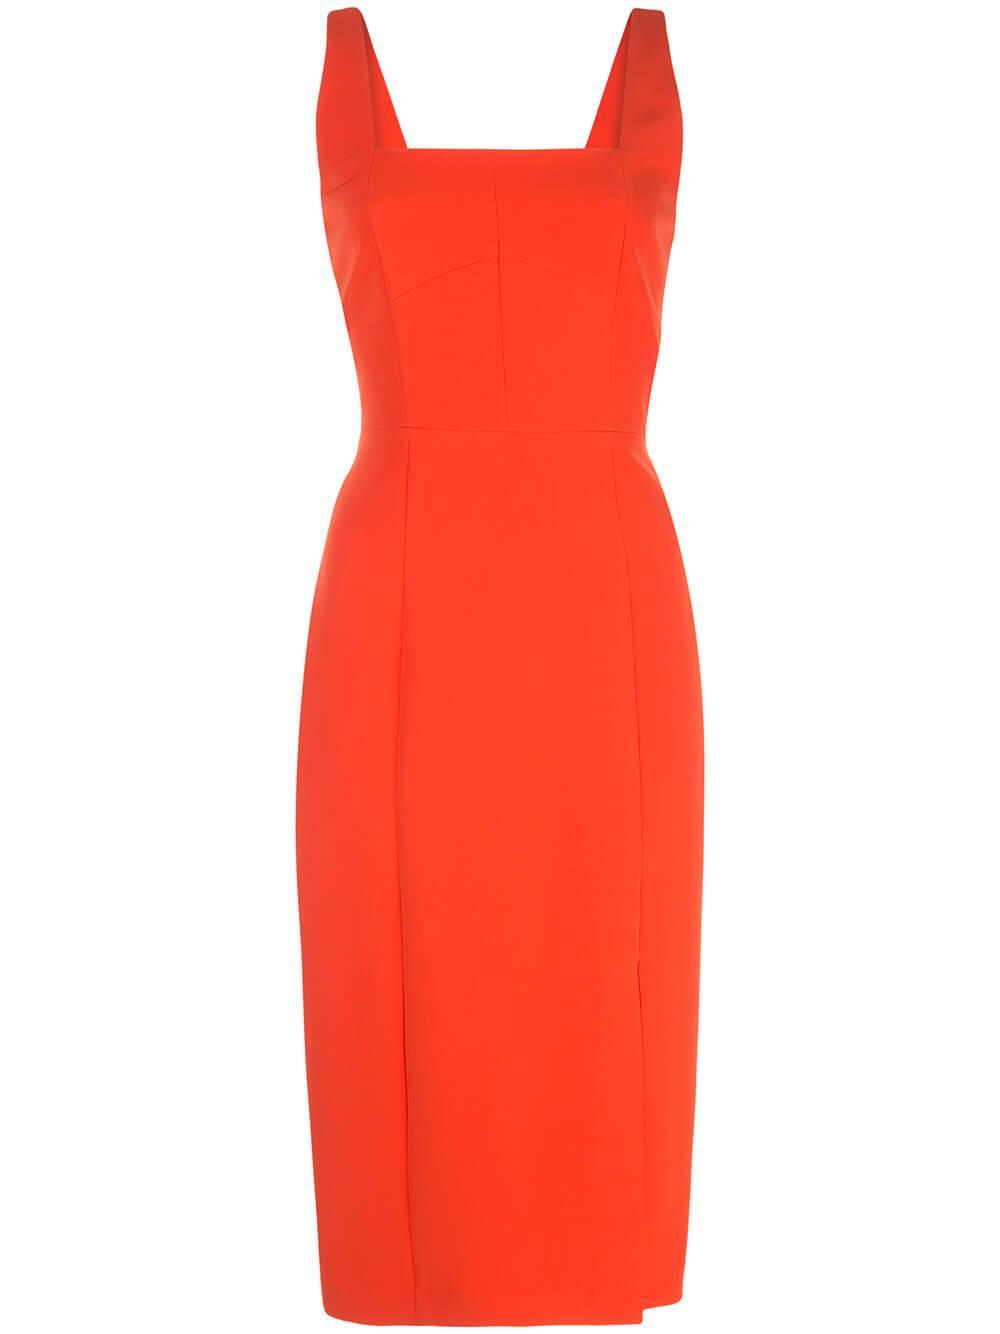 Cady Rita Square Neck Midi Dress Item # 01RD48